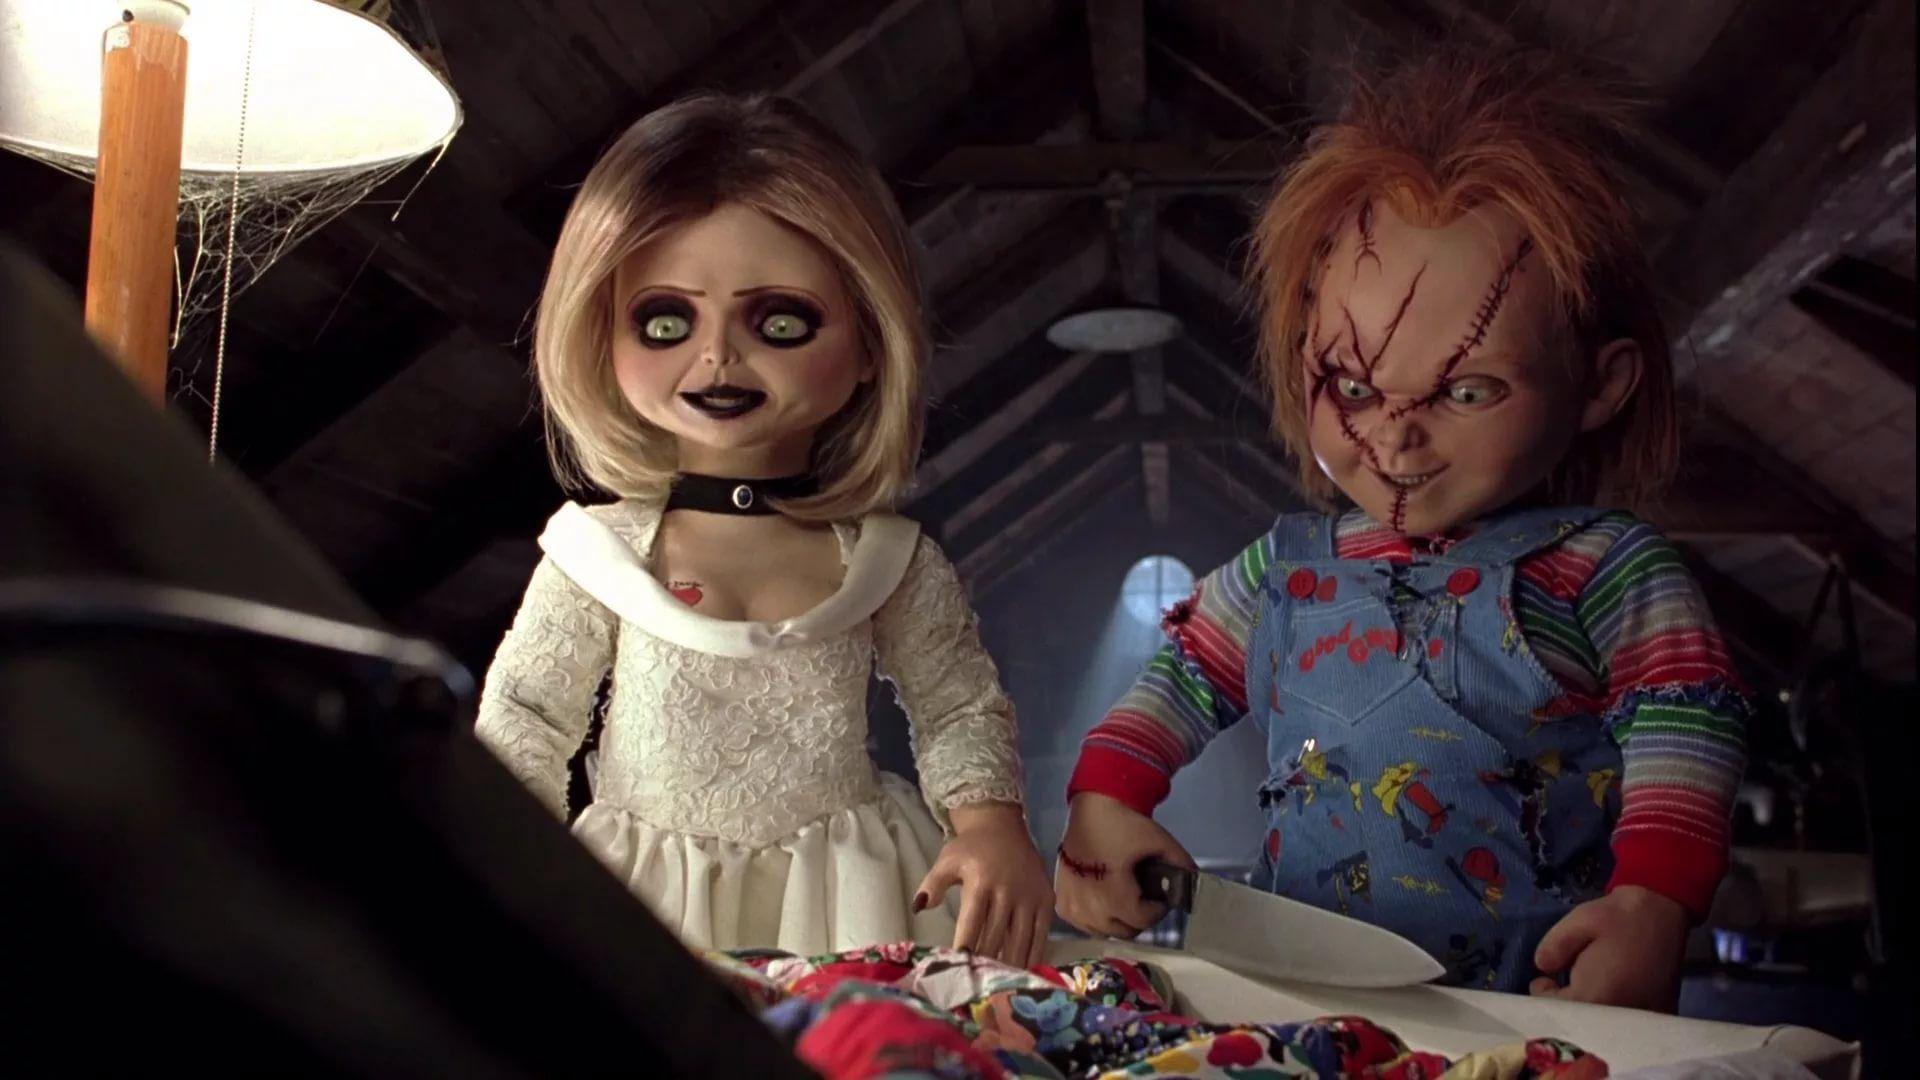 Chucky Doll wallpaper theme